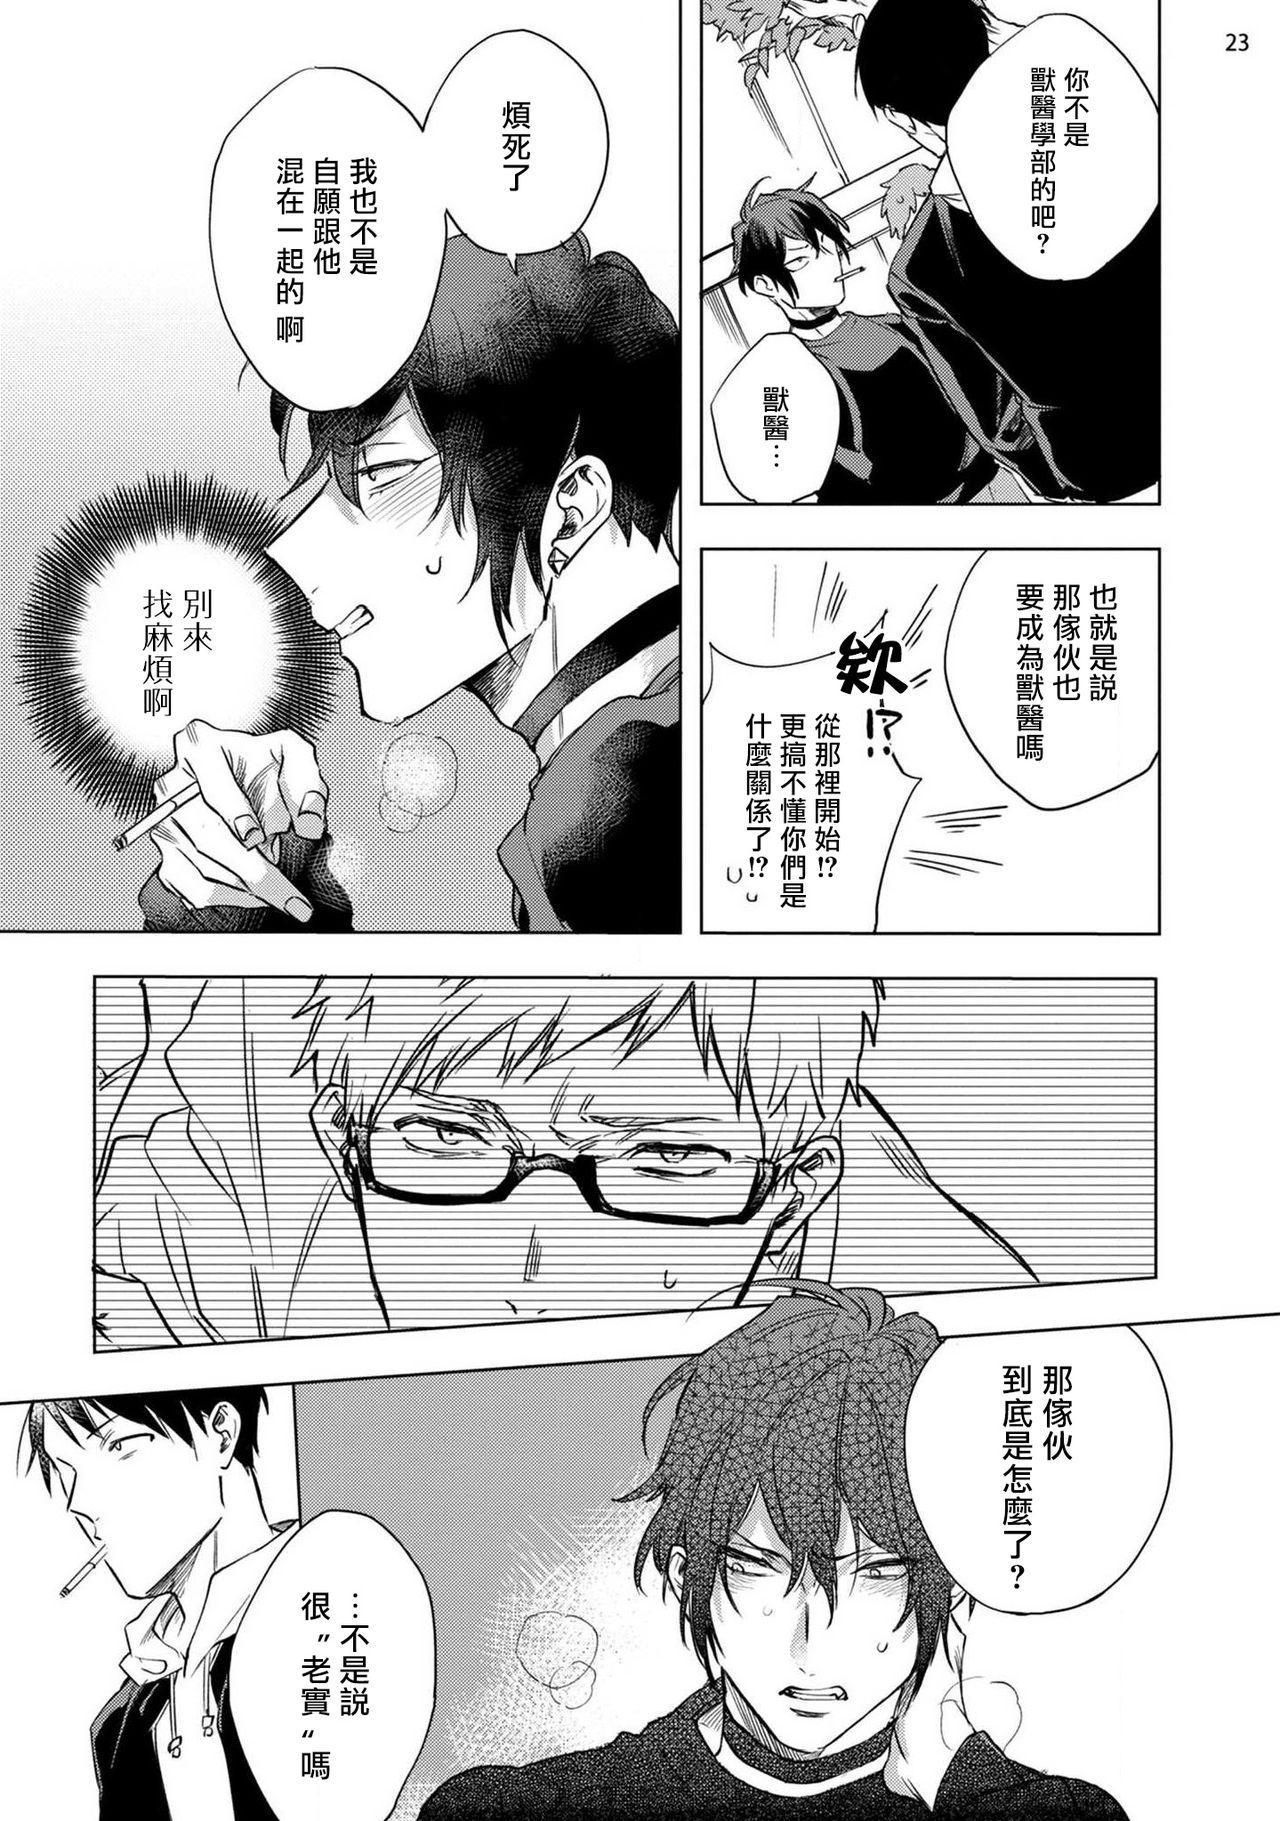 [Yao] Inma-sama ni Hallelujah!   赞美淫魔大人! Ch. 1-3 [Chinese] [拾荒者汉化组] [Digital] 59